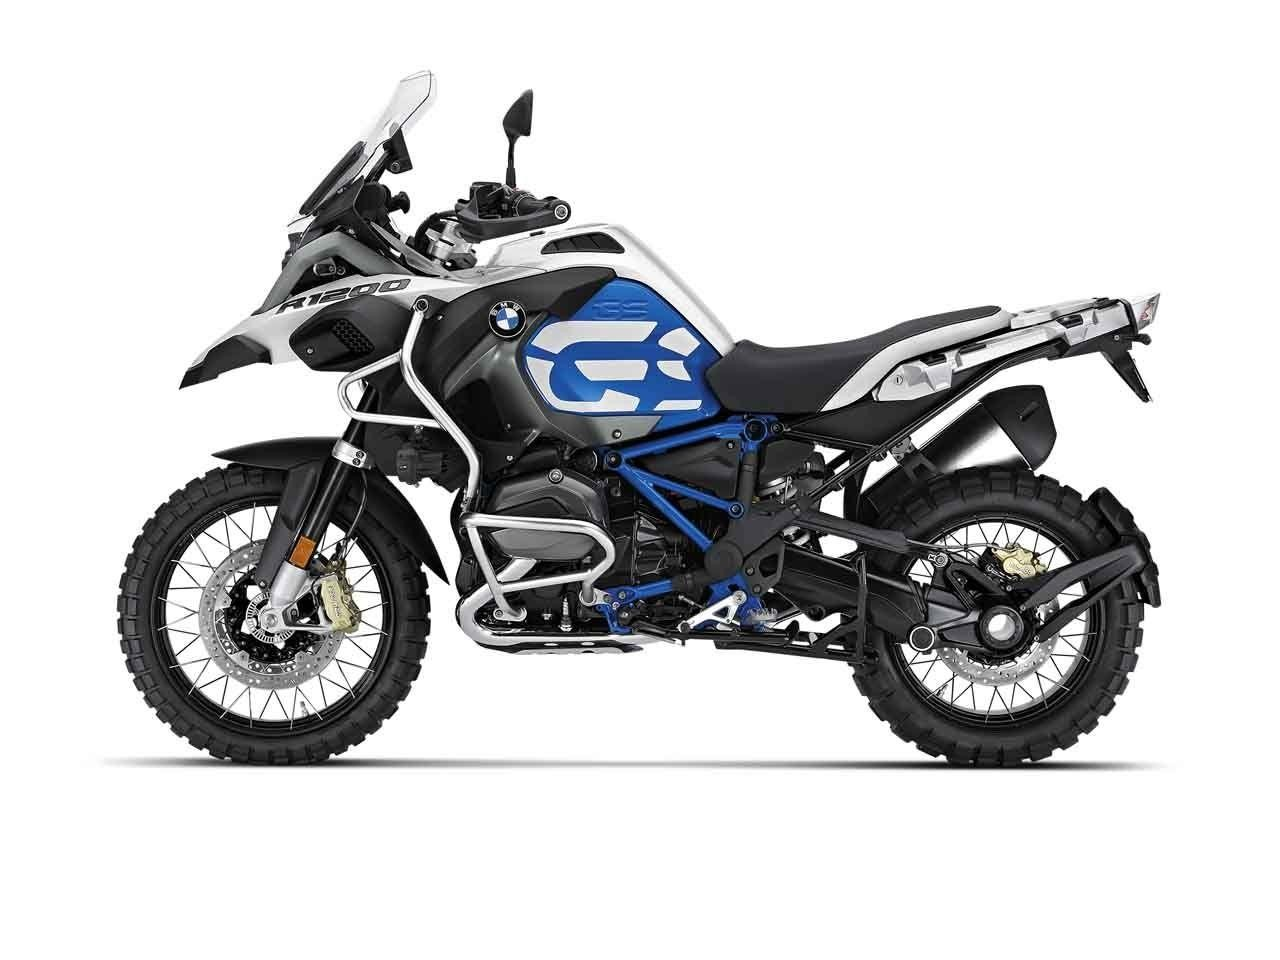 Motorrad Mieten Bmw R 1200 Gs Adventure Arrigoni Sport Gmbh Adliswil